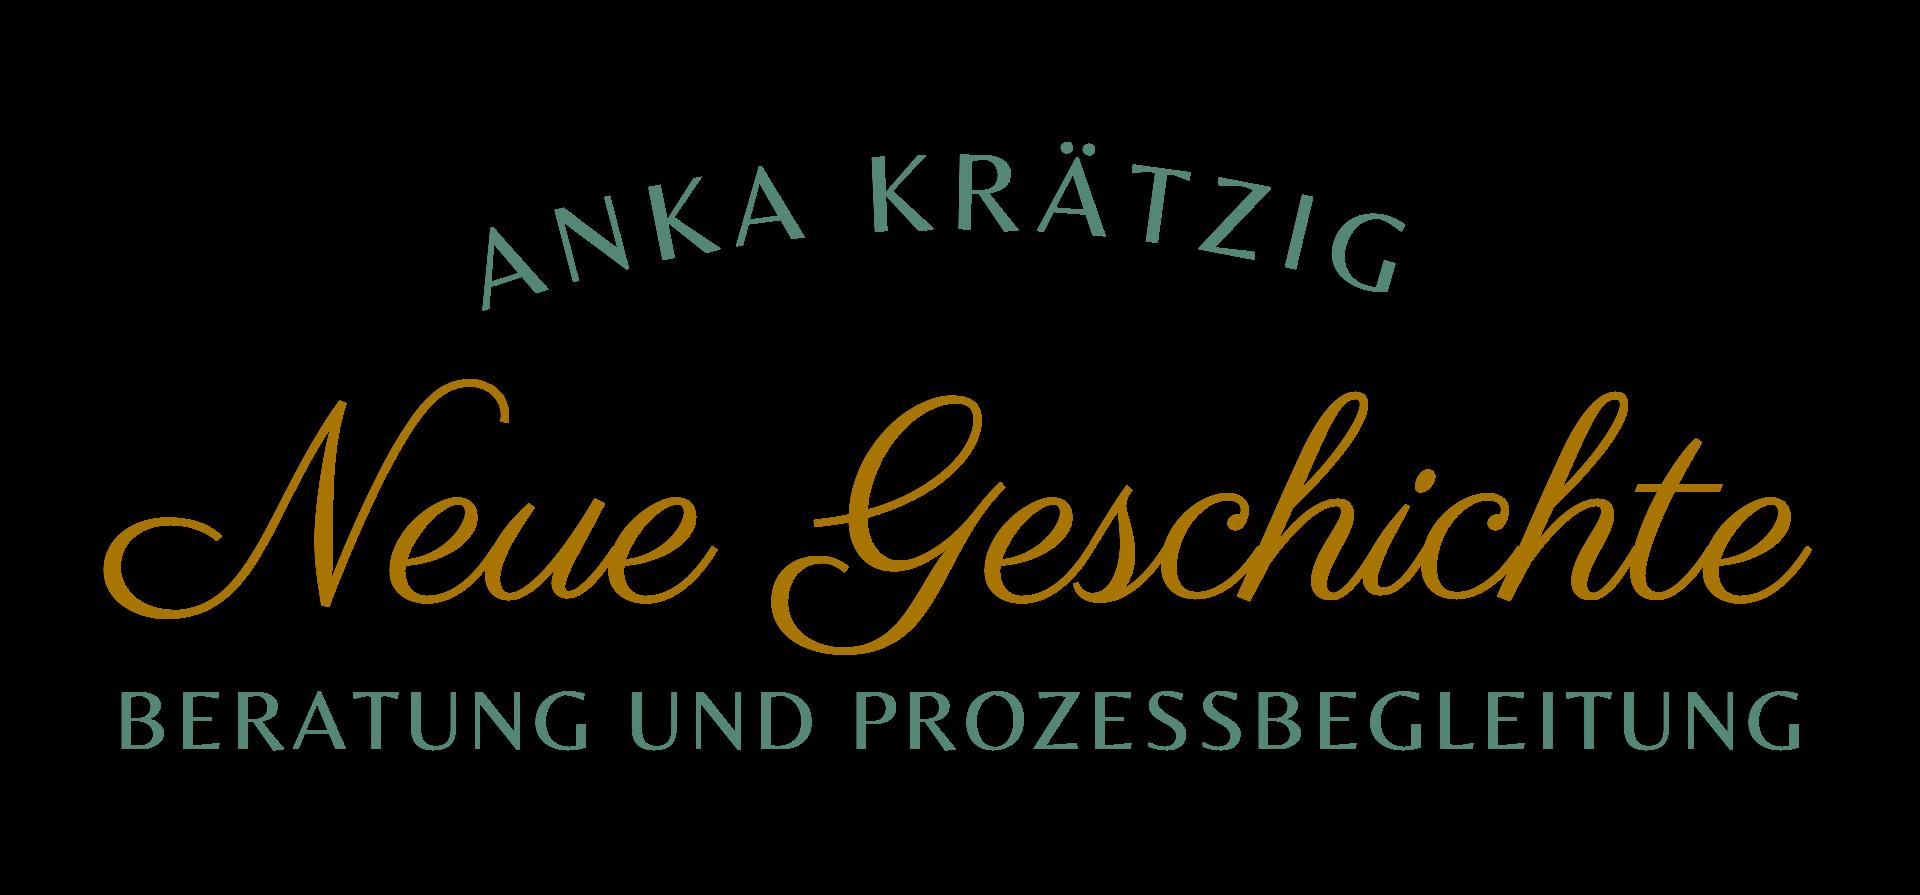 Anka Krätzig// Neue Geschichte